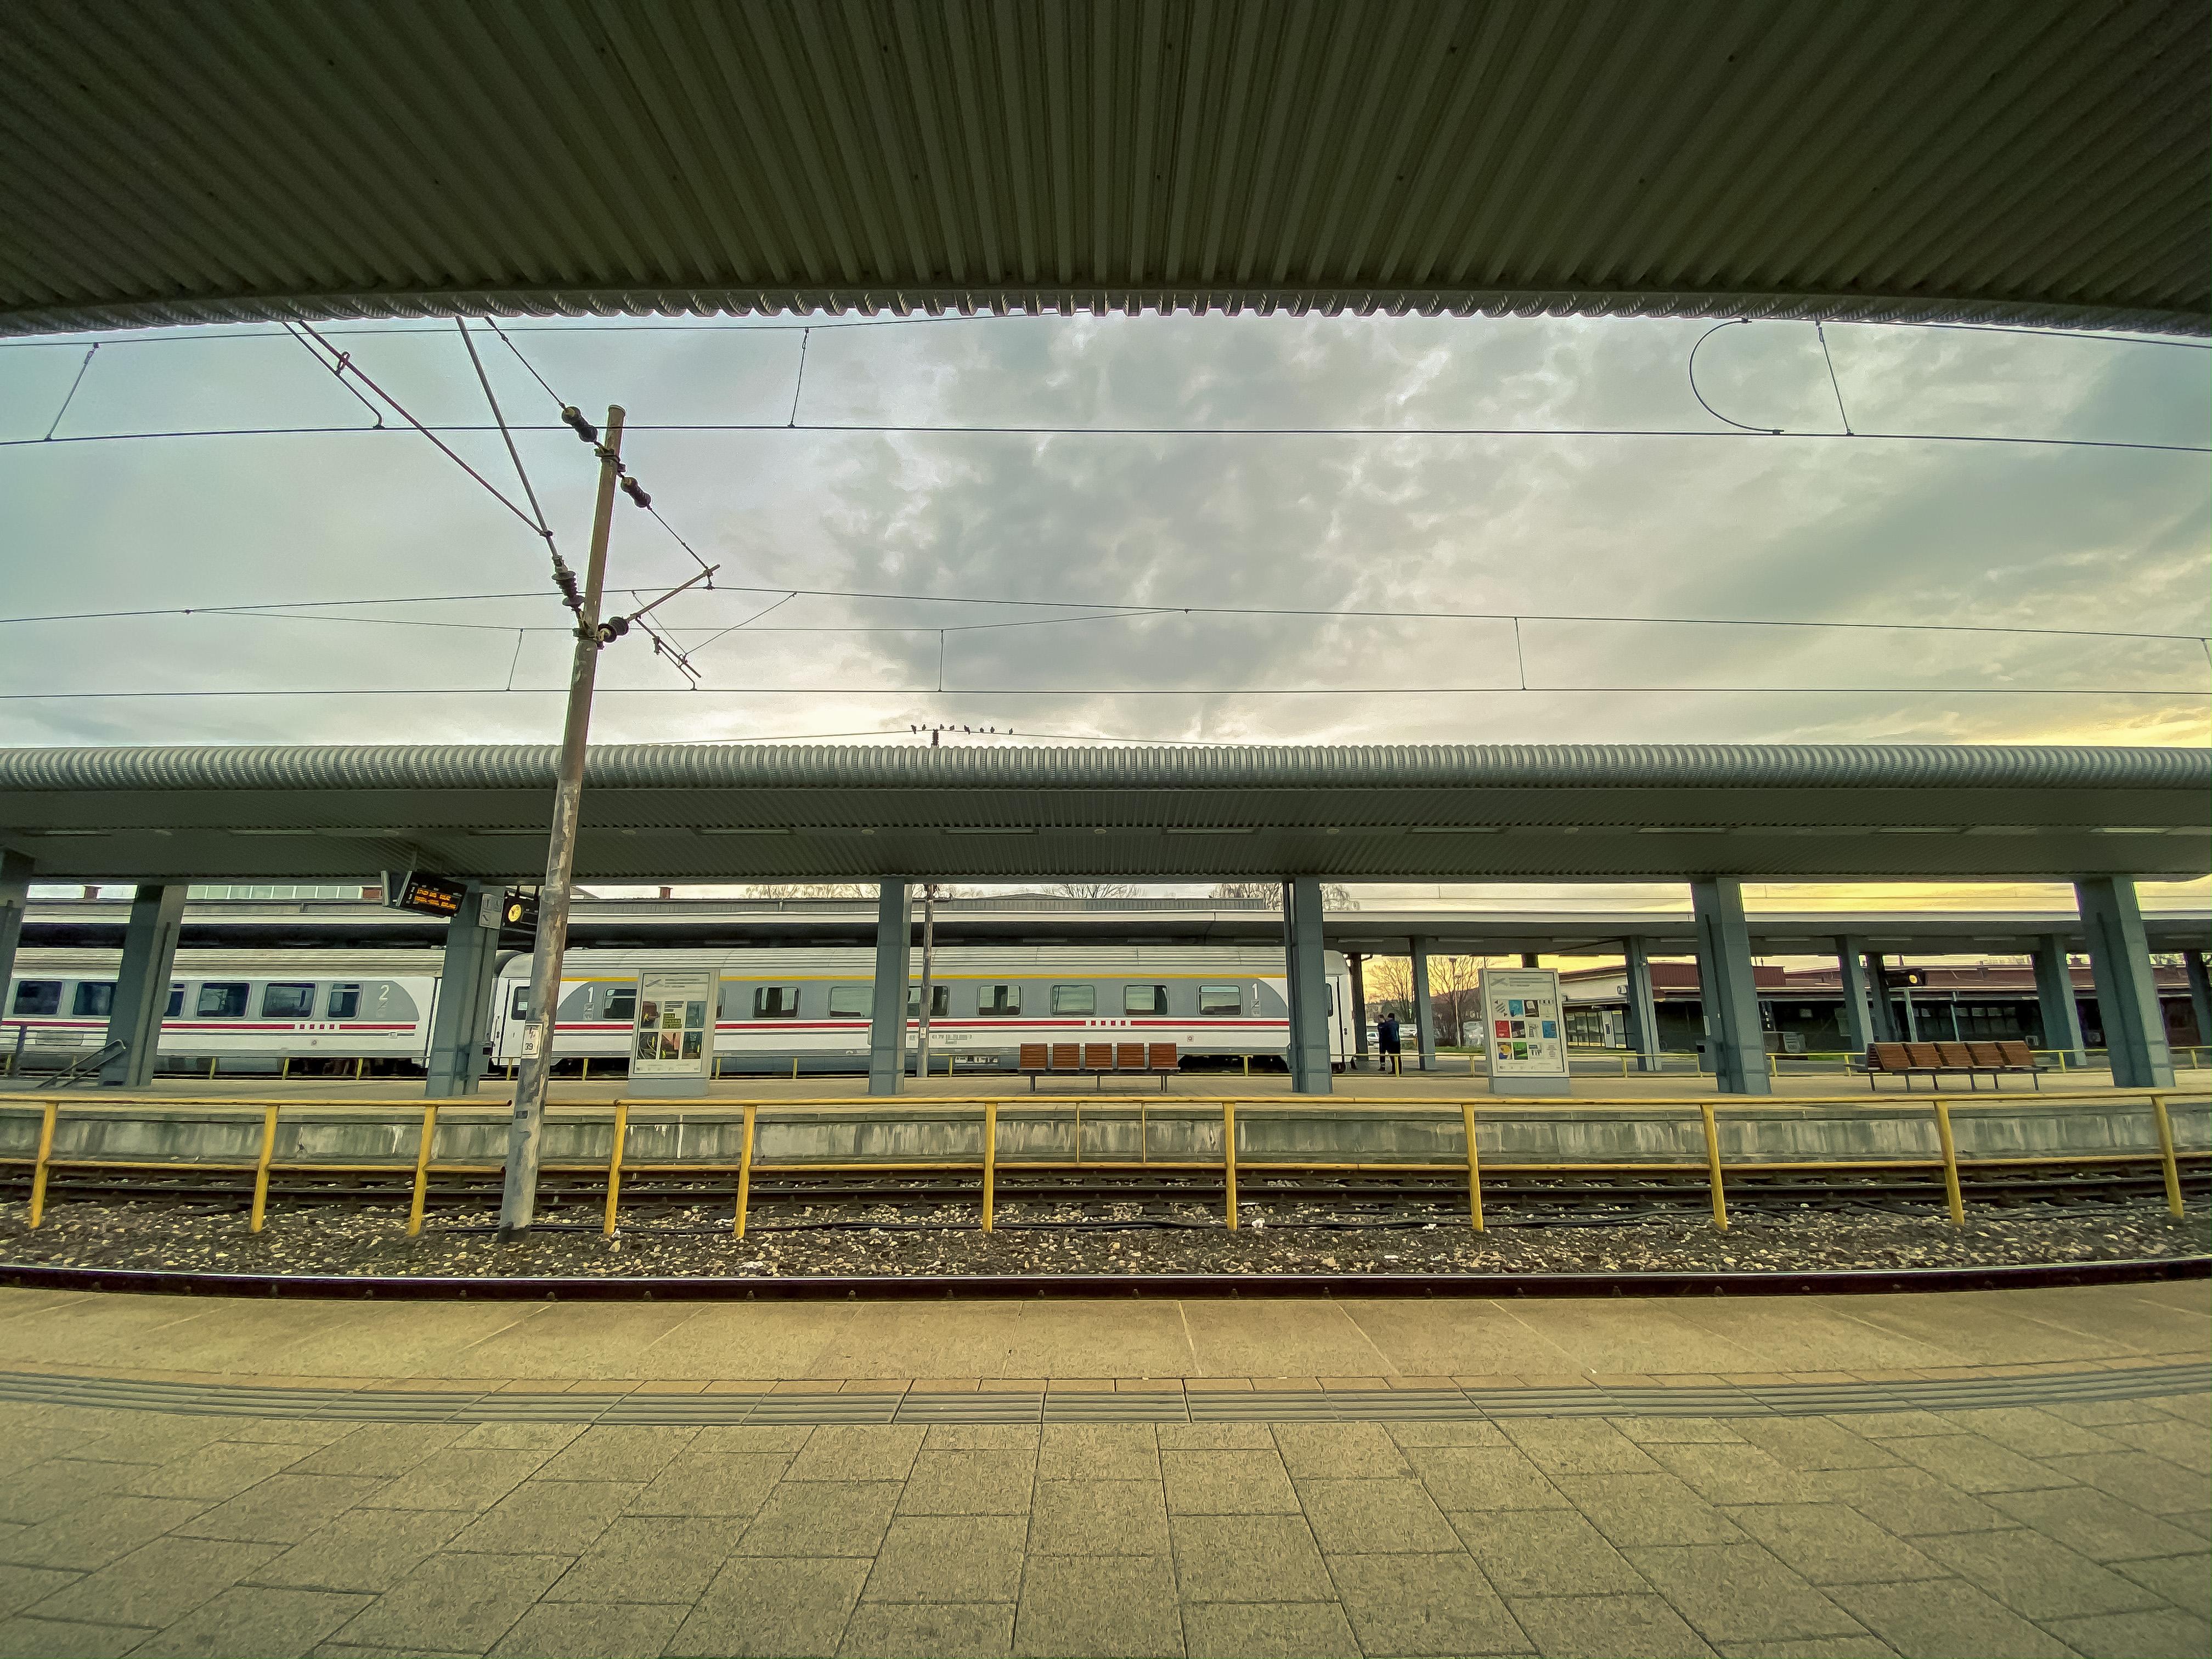 Large railway investments in Croatia has begun